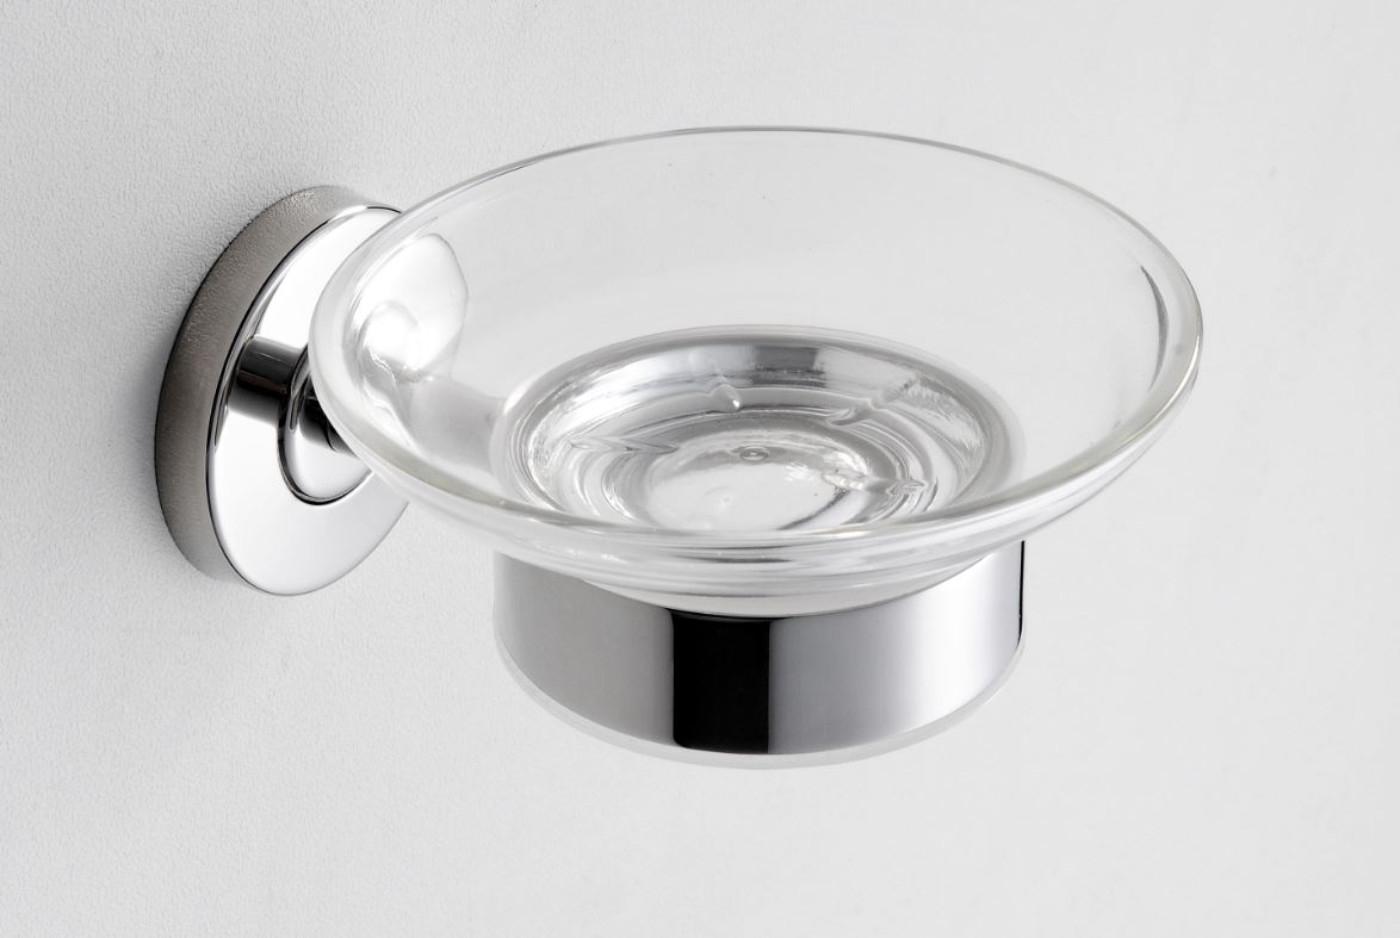 Wiesbaden Brush zeephouder RVS 304 met glas